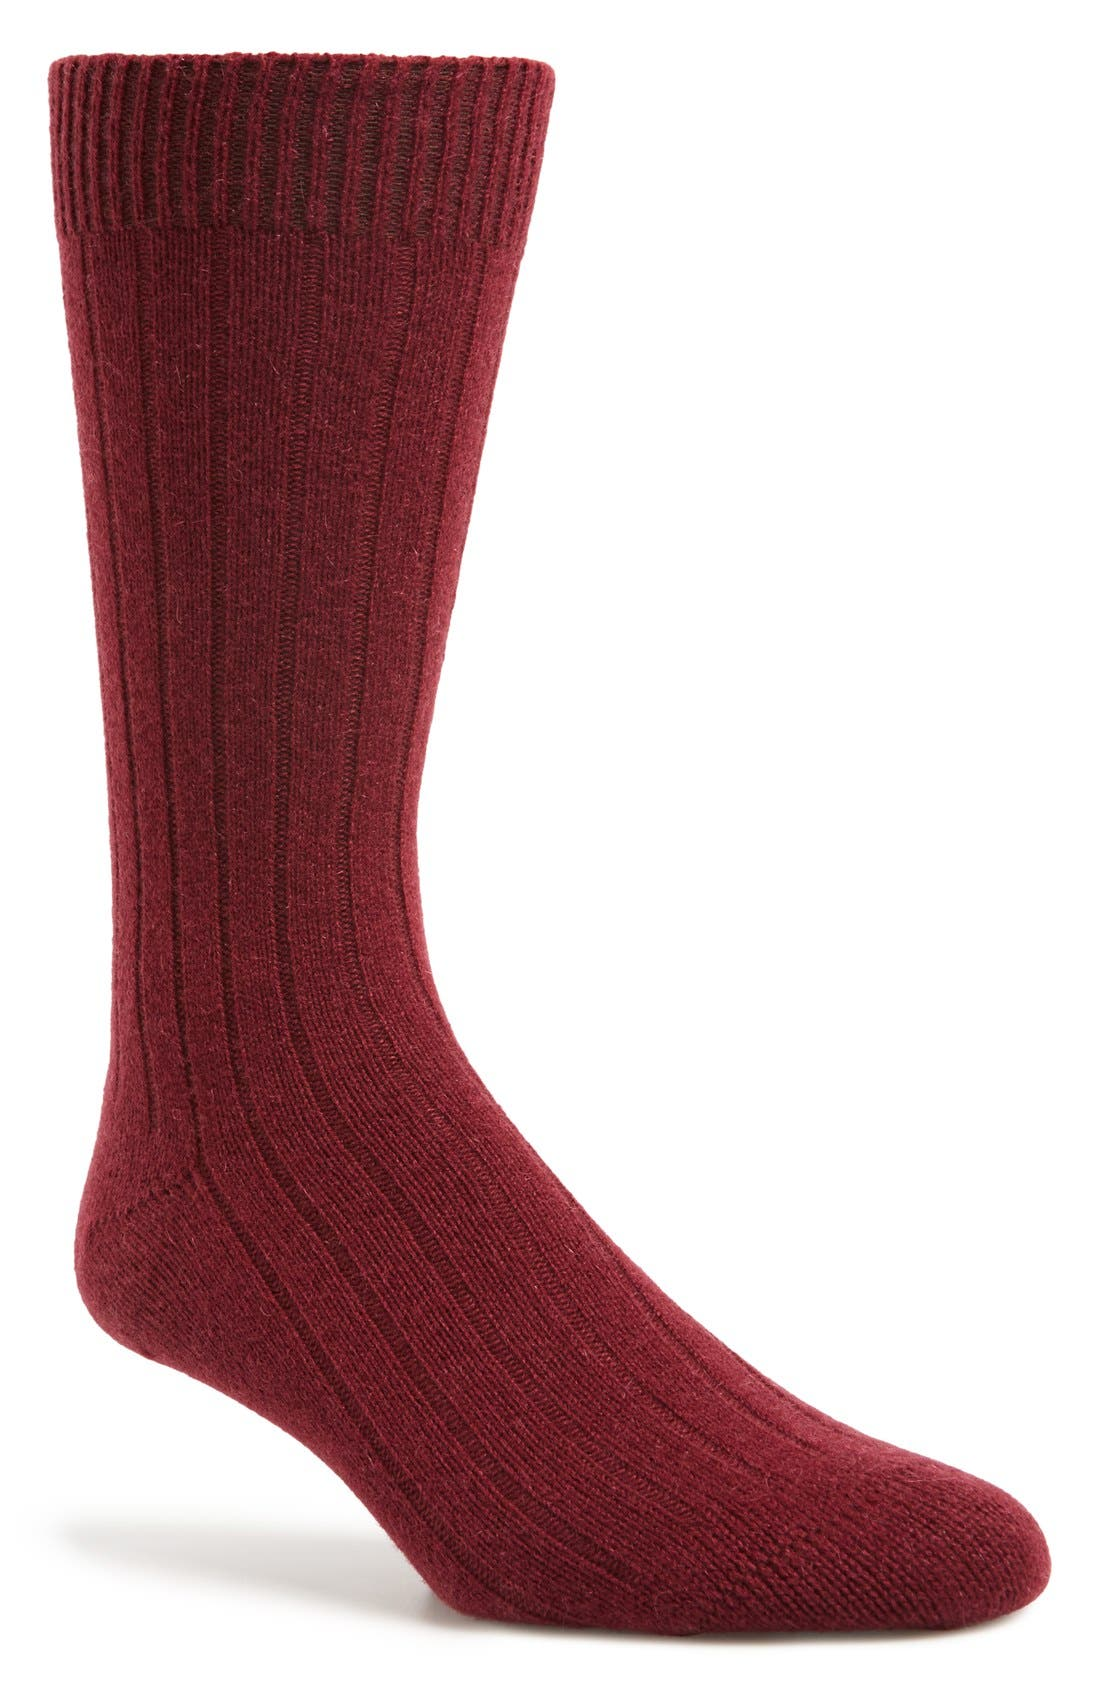 'Waddington' Cashmere Blend Mid Calf Socks,                         Main,                         color, Port